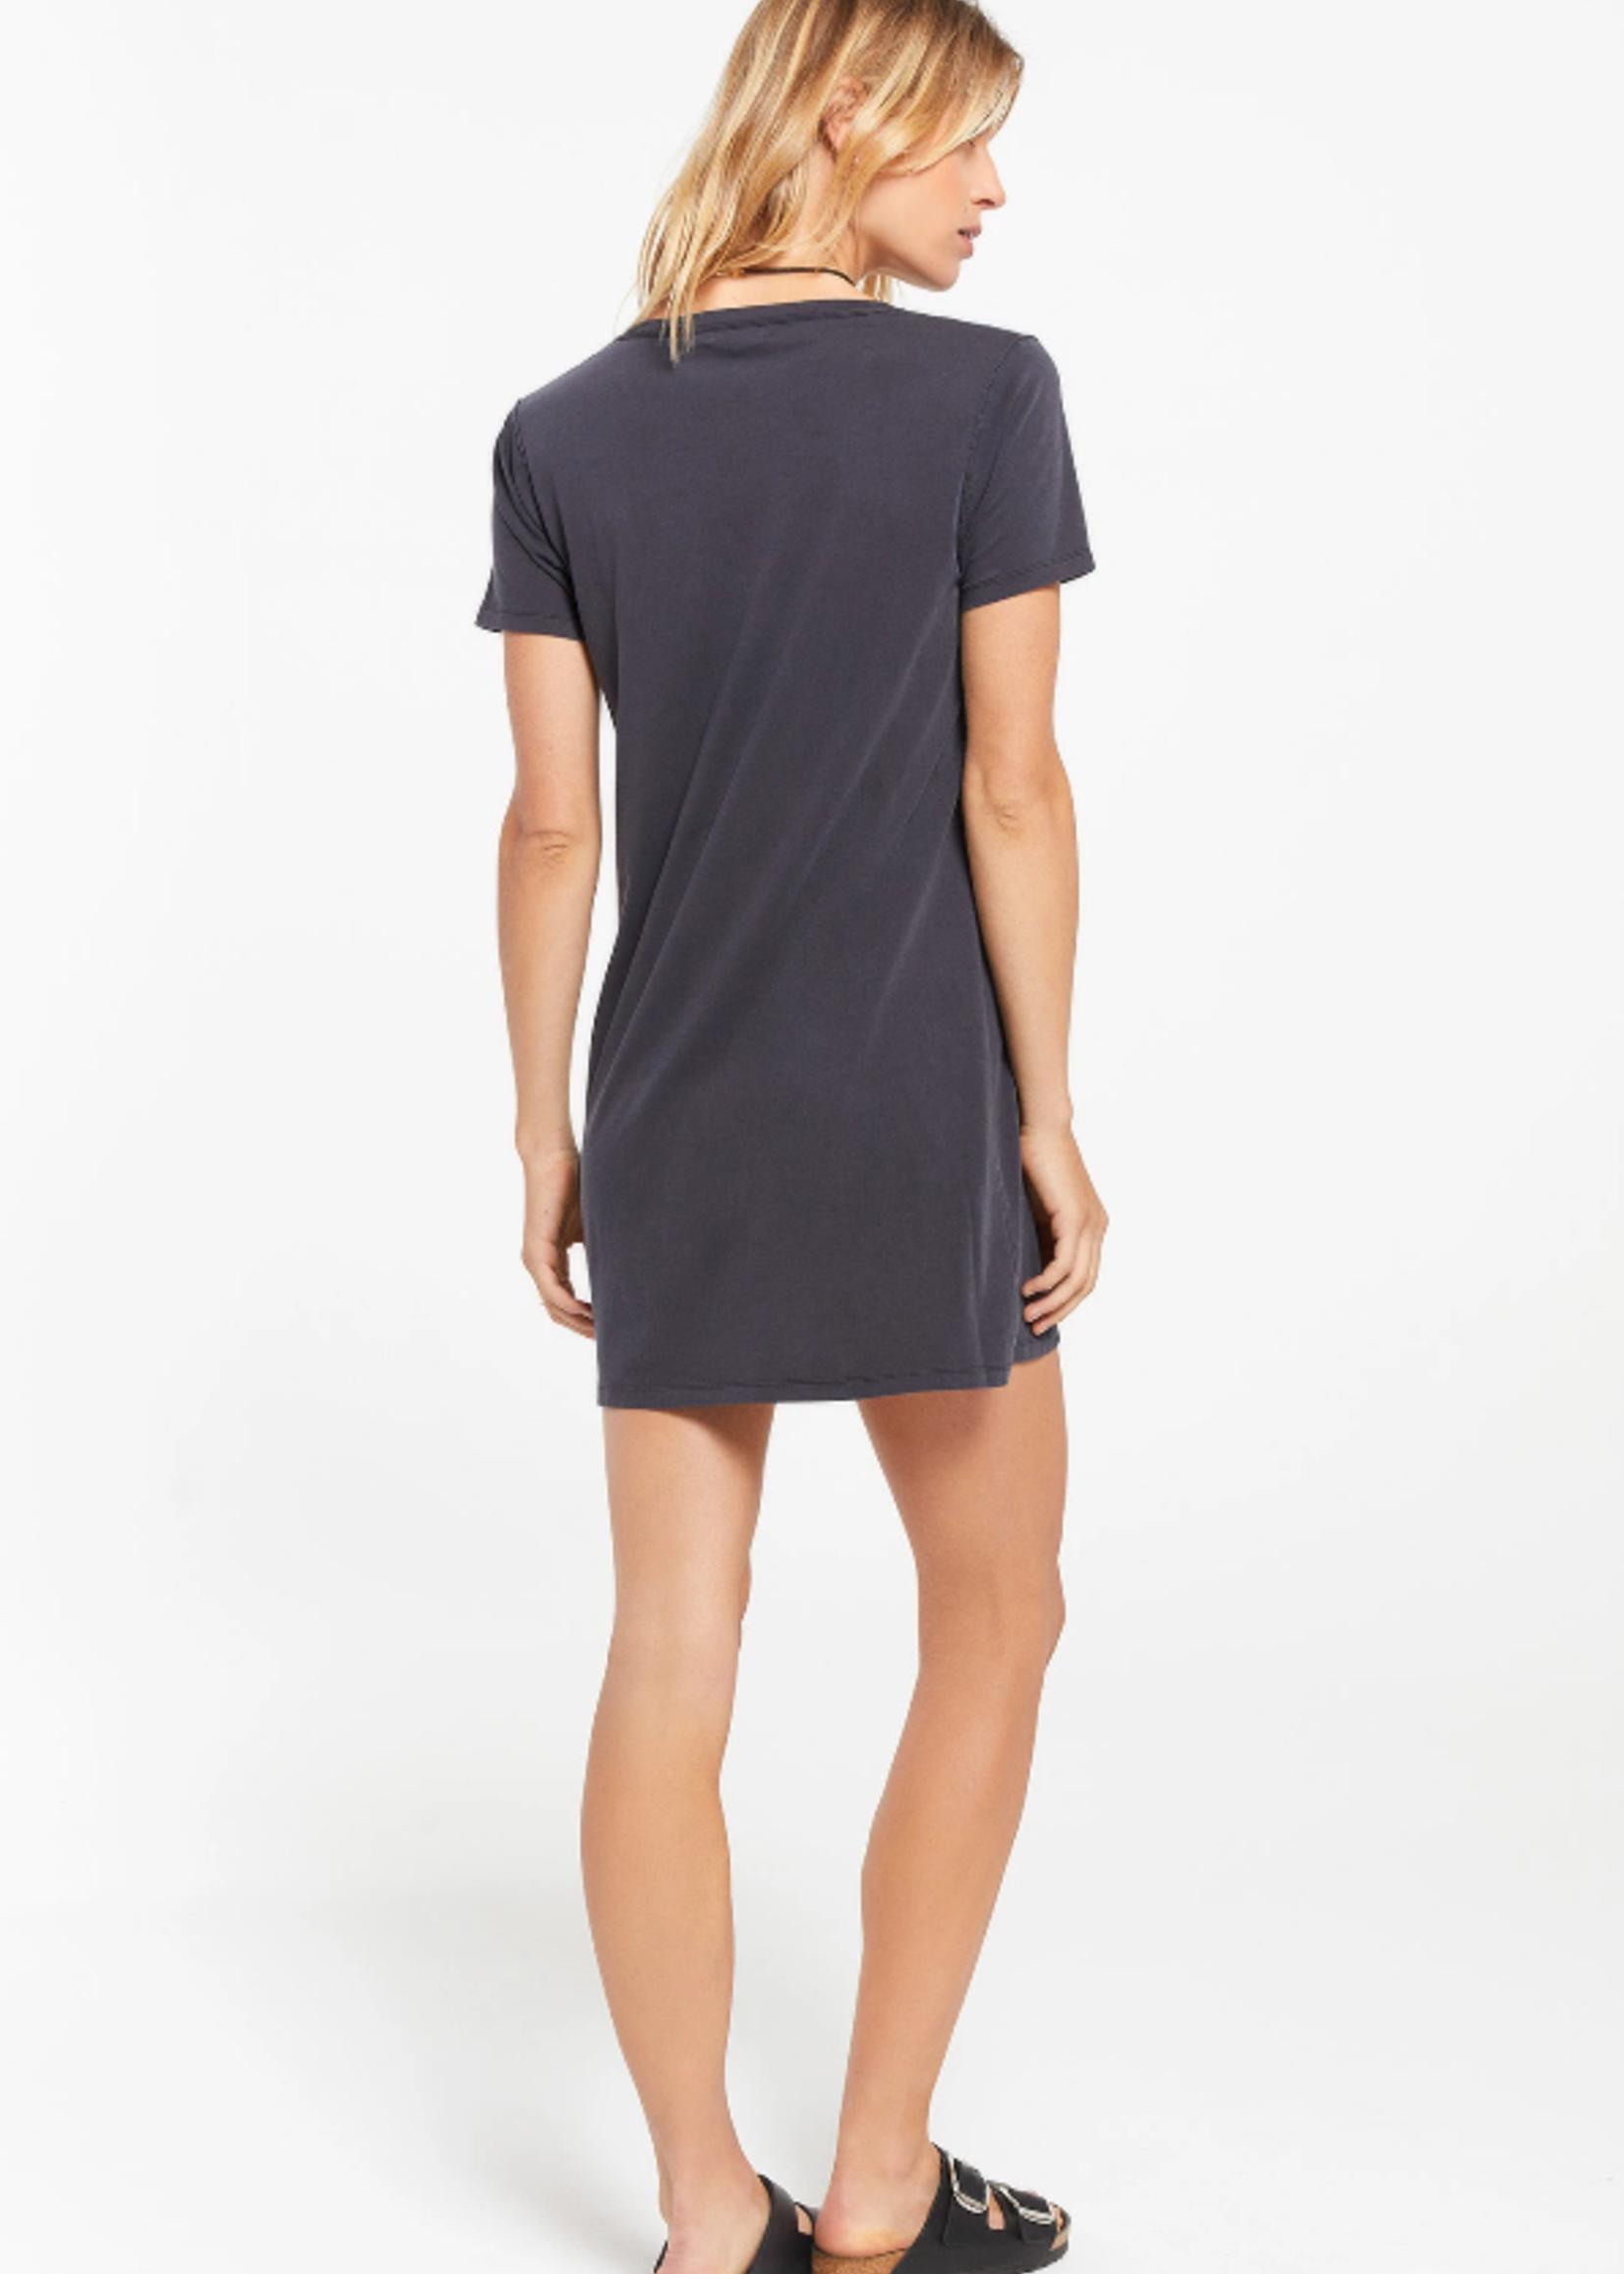 Z Supply Organic T-shirt Dress - Black